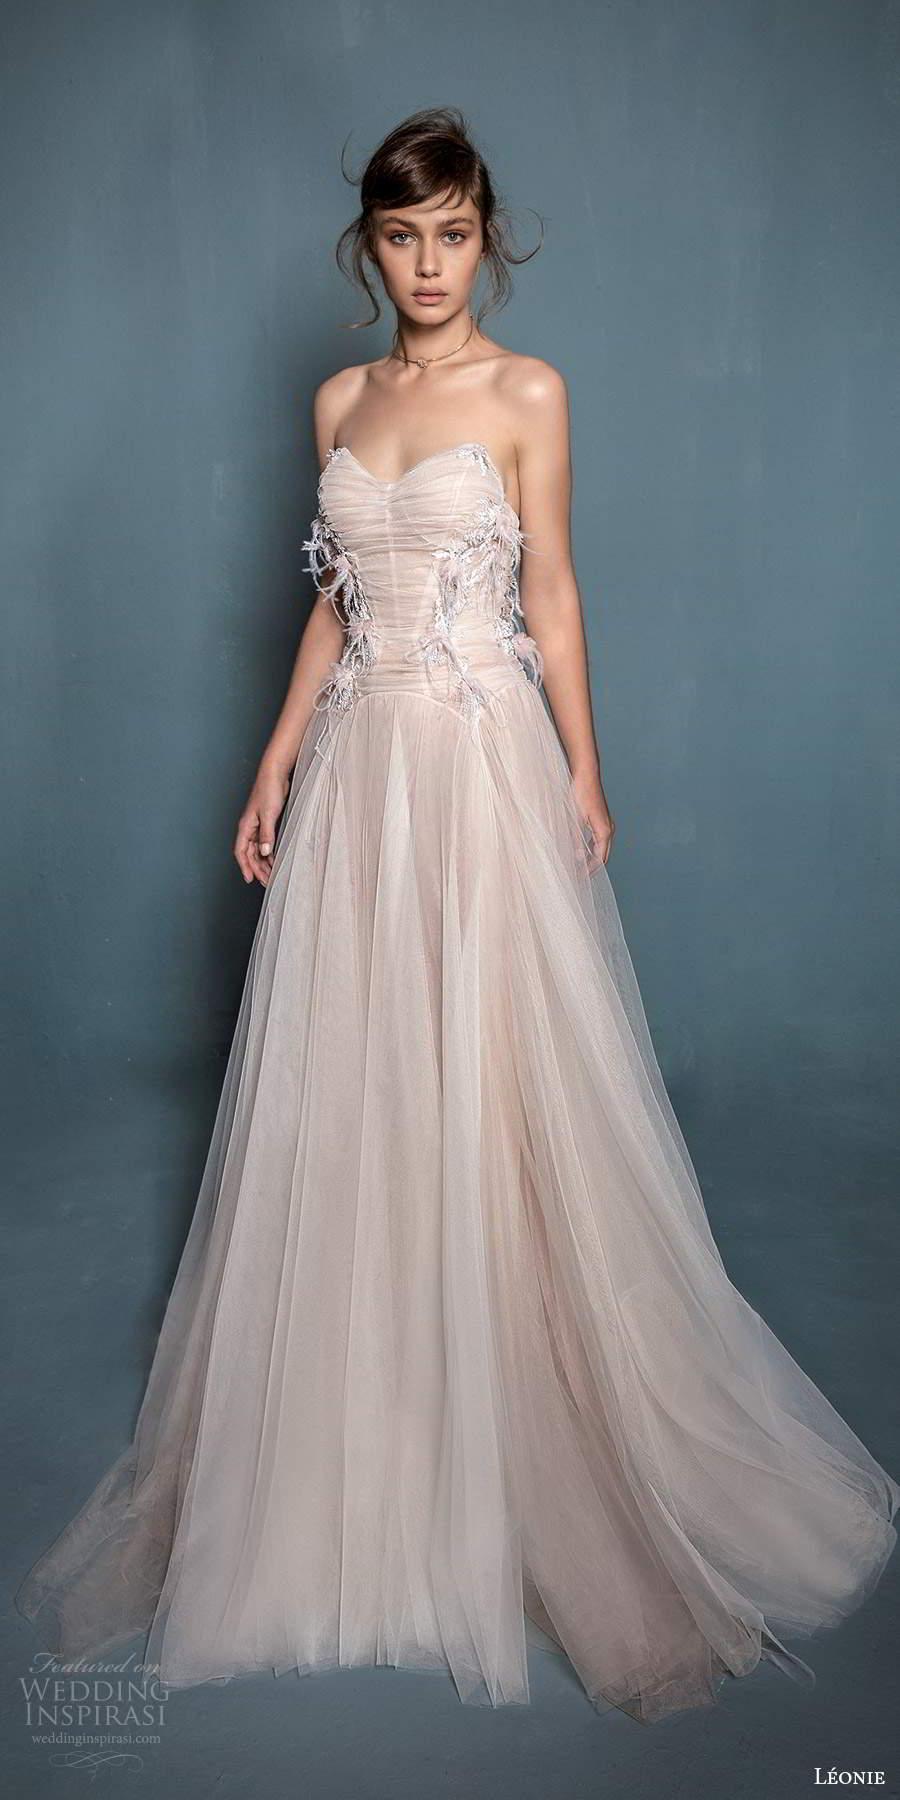 leonie bridal 2020 bridal strapless sweetheart neckline ruched bodice a line ball gown wedding dress chapel train slit skirt (5) fv